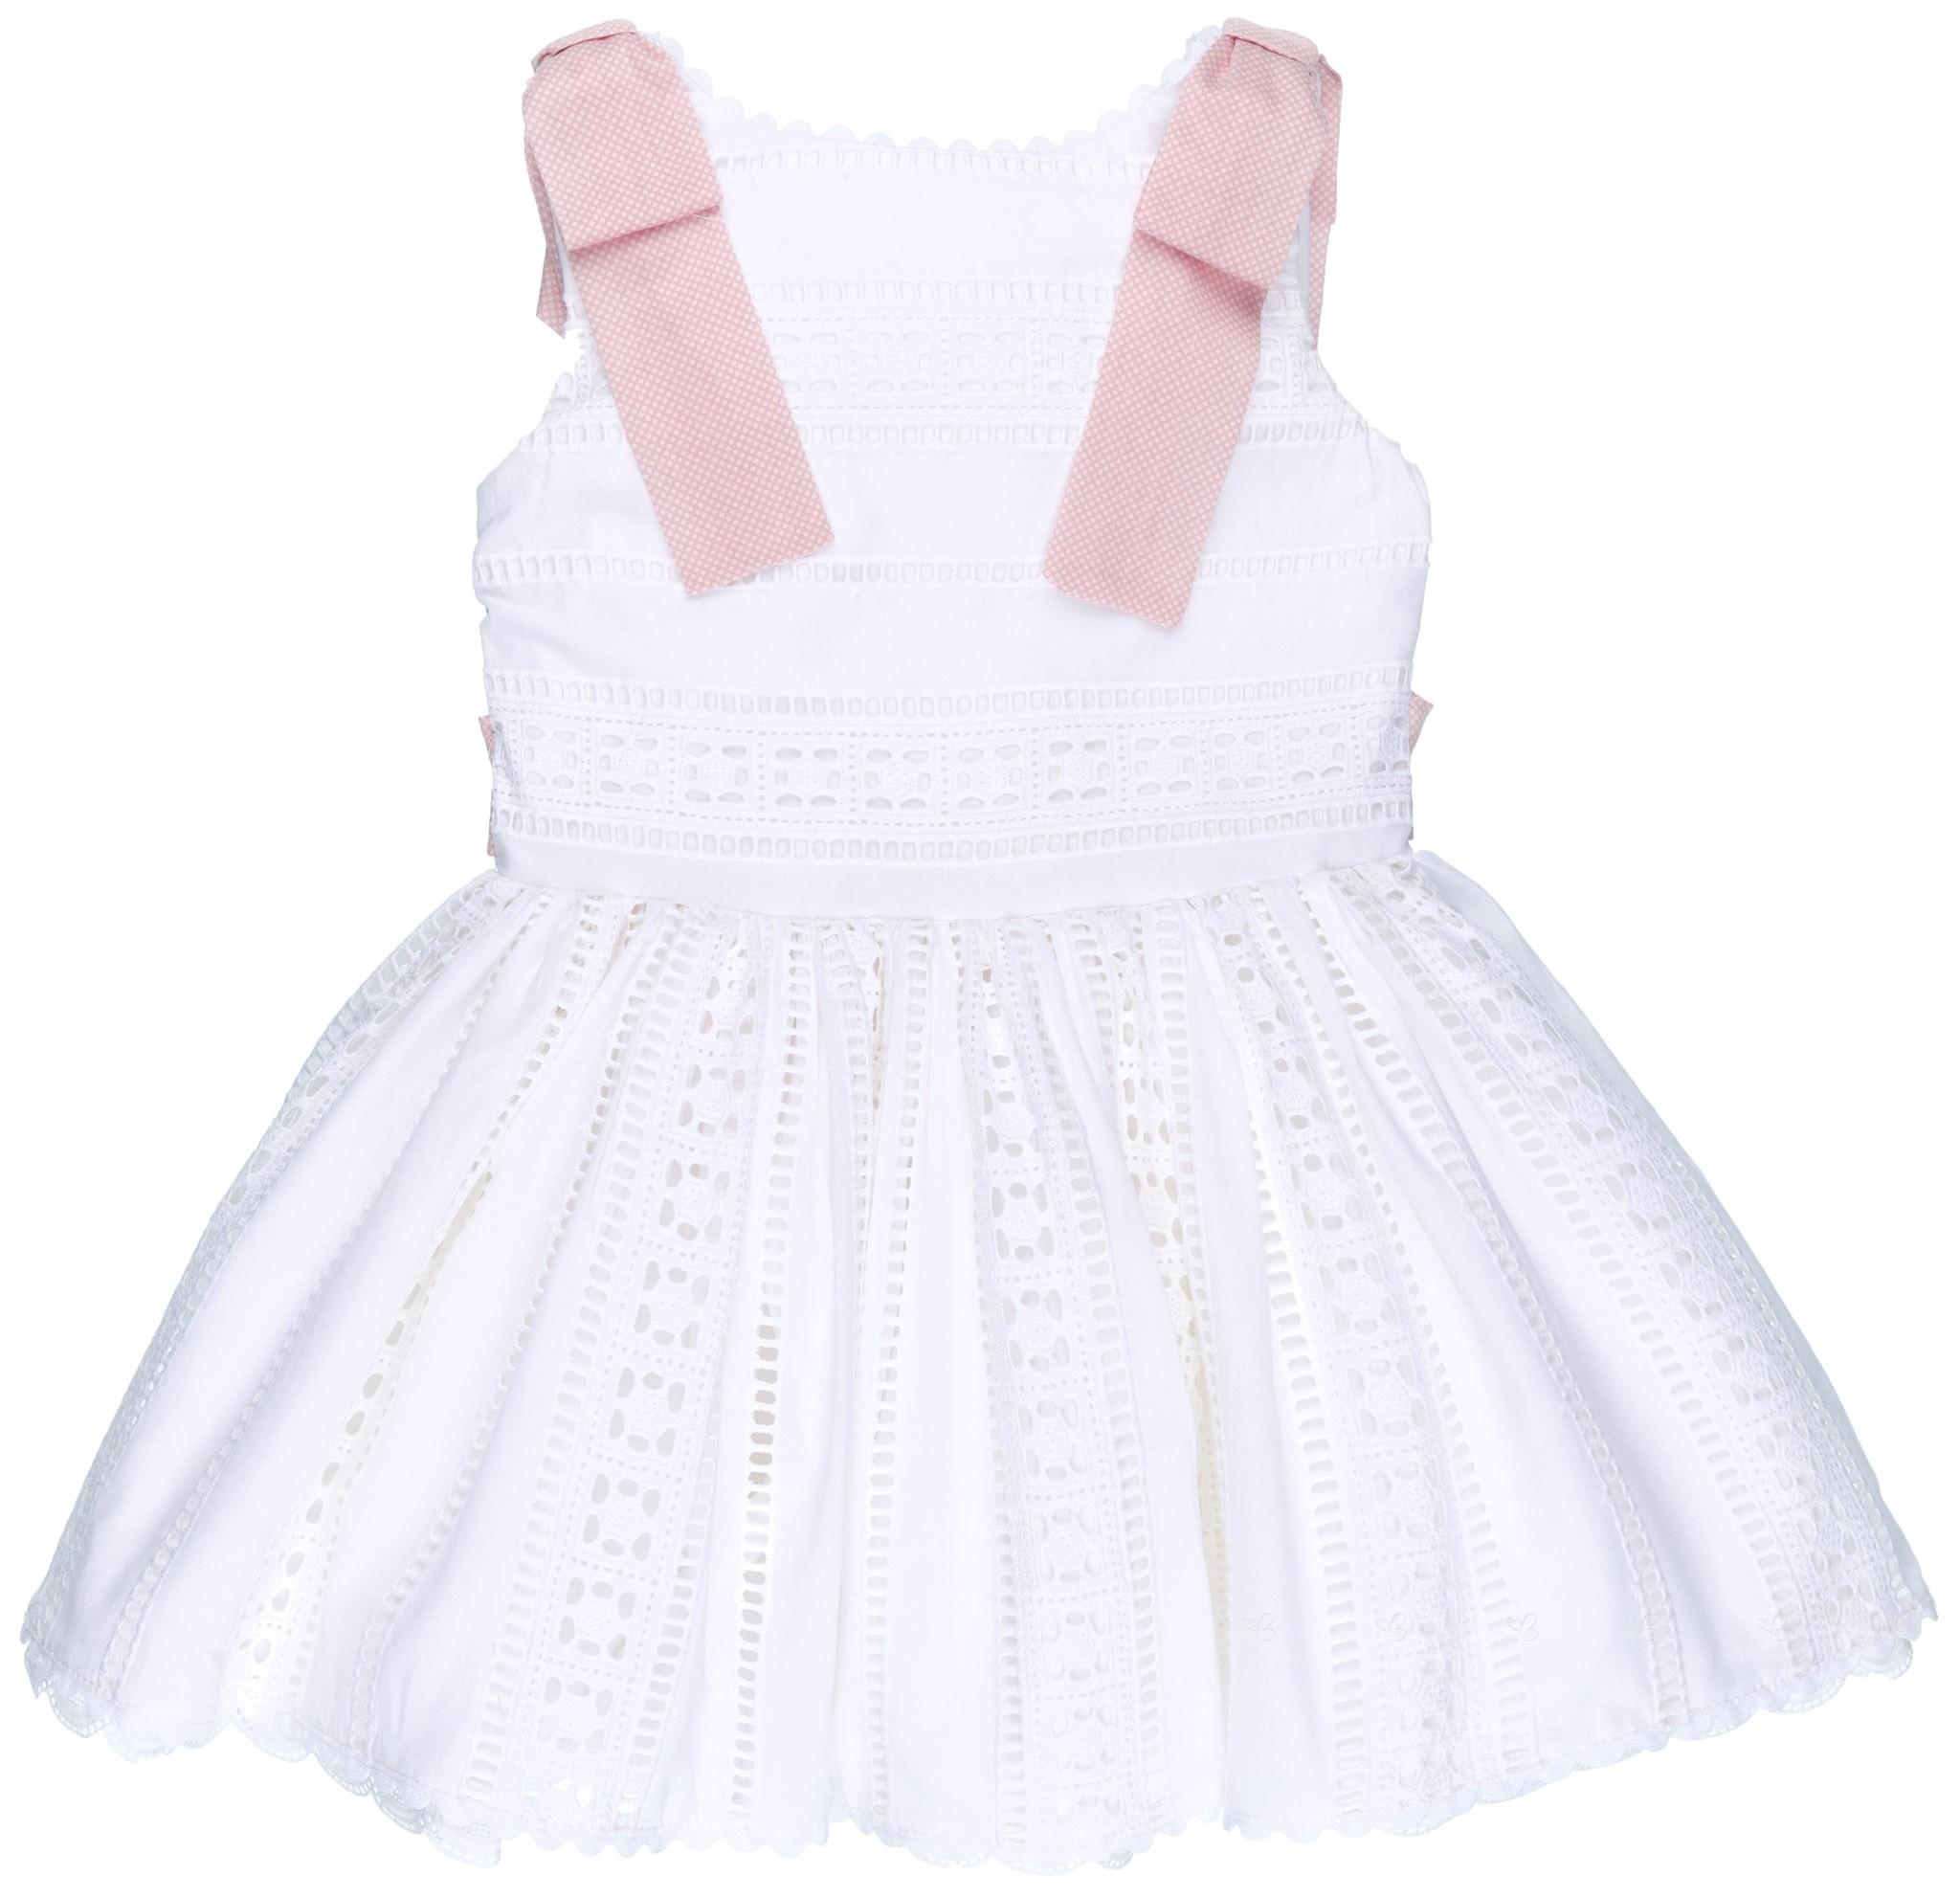 84095f7f0 Badum Badero Vestido Niña Algodón Perforado Blanco & Lazos Lunares Rosa ...